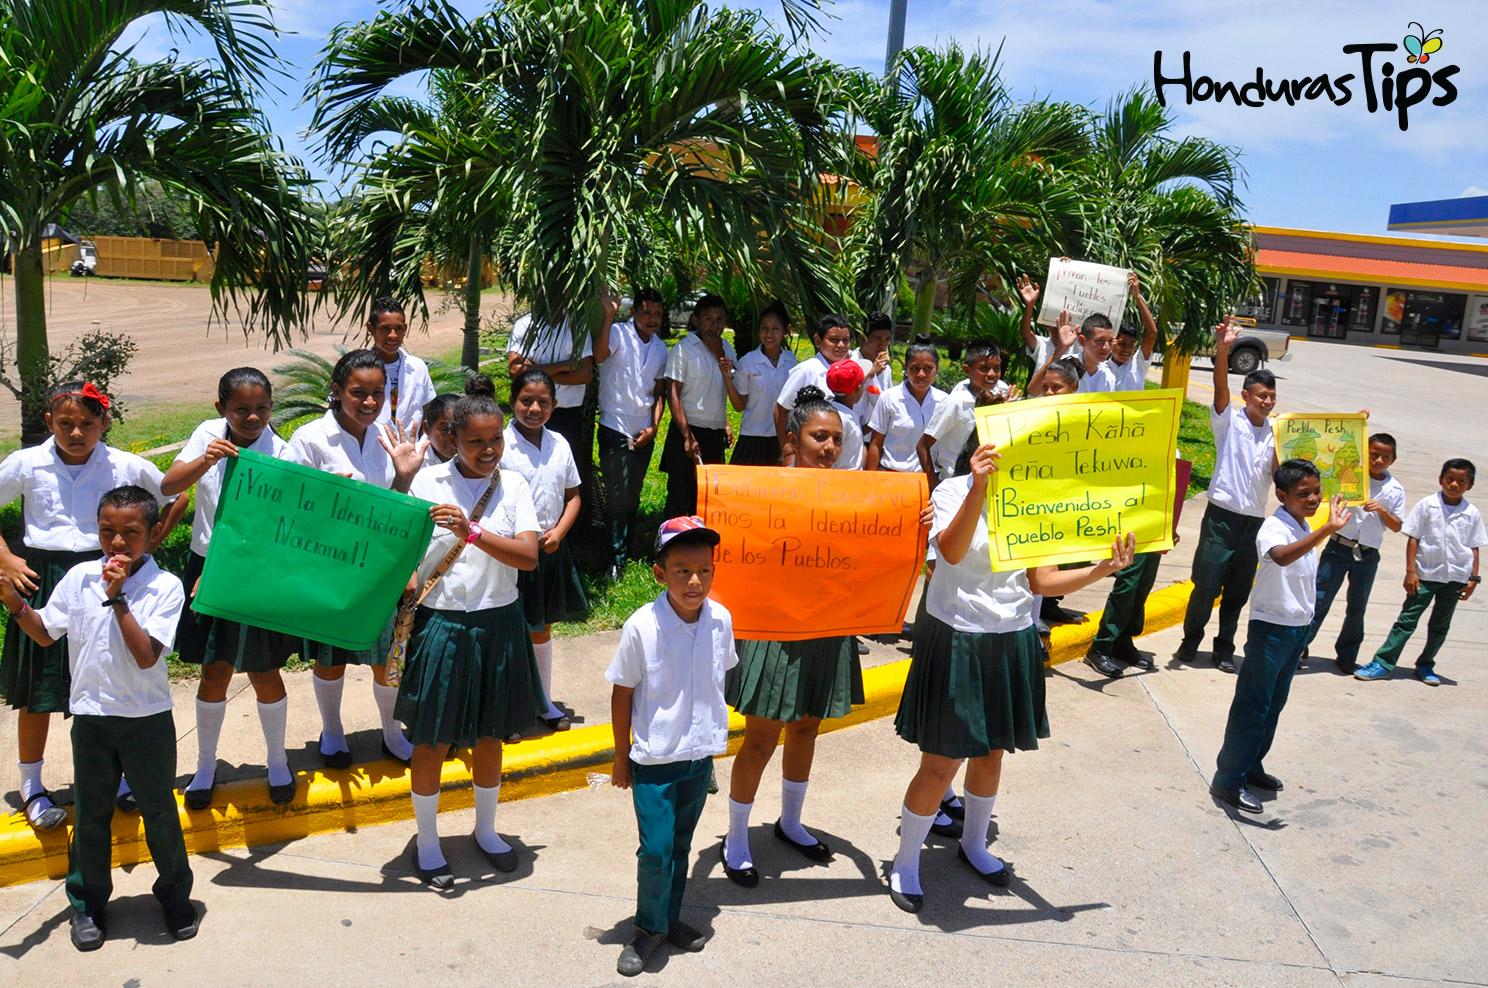 Los estudiantes del instituto Elvira Tomé mostraron pancartas en idioma Pech.